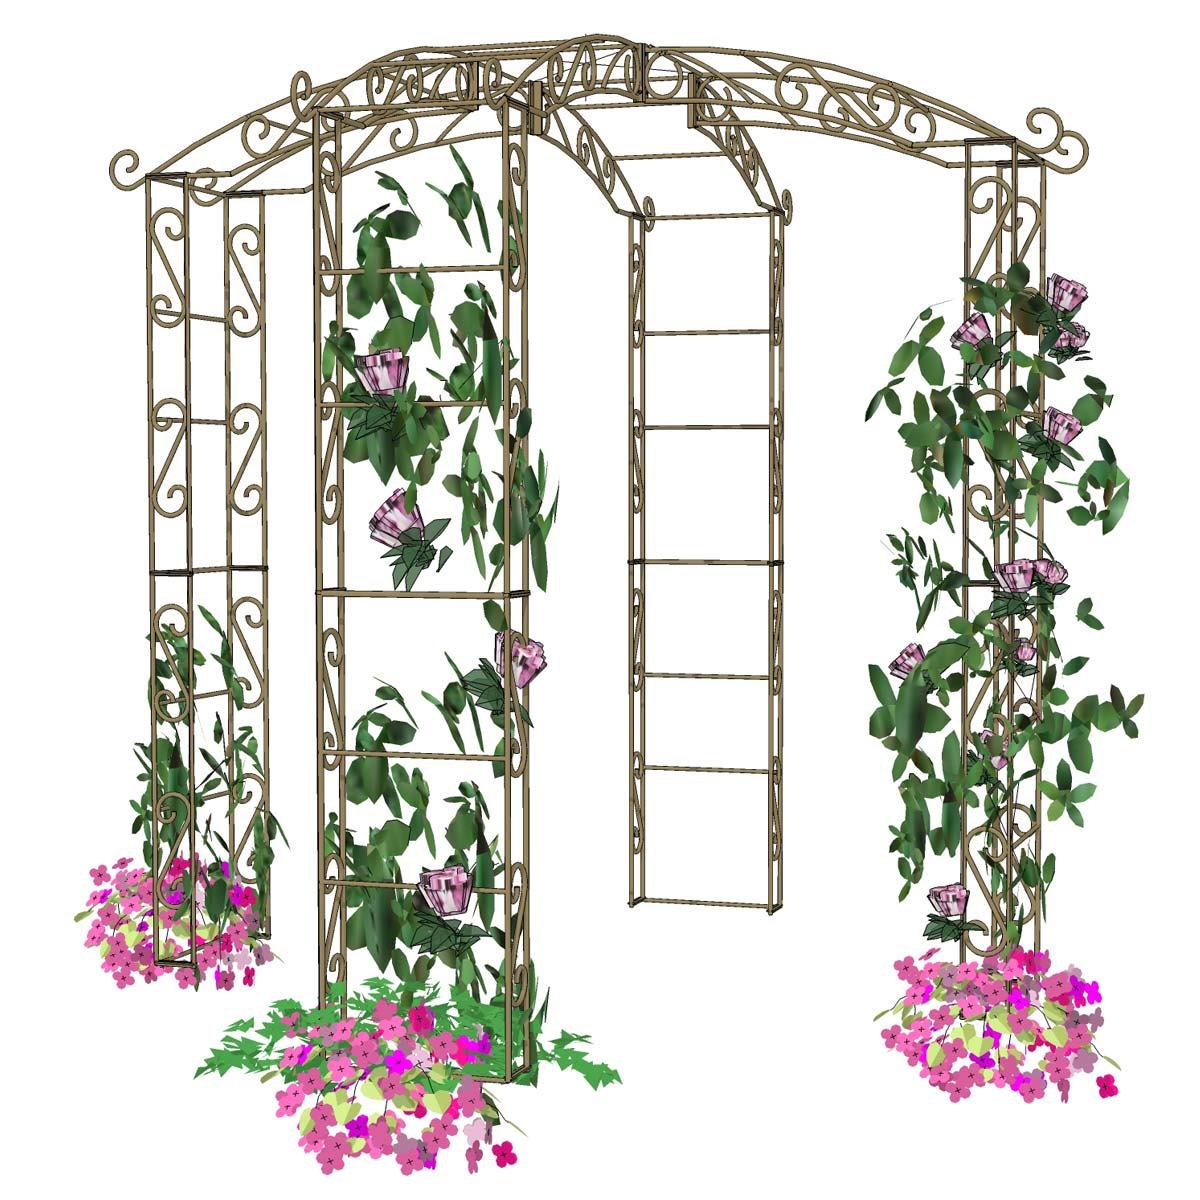 Kiosque de jardin synonyme - Kiosque de jardin en bois pas cher ...